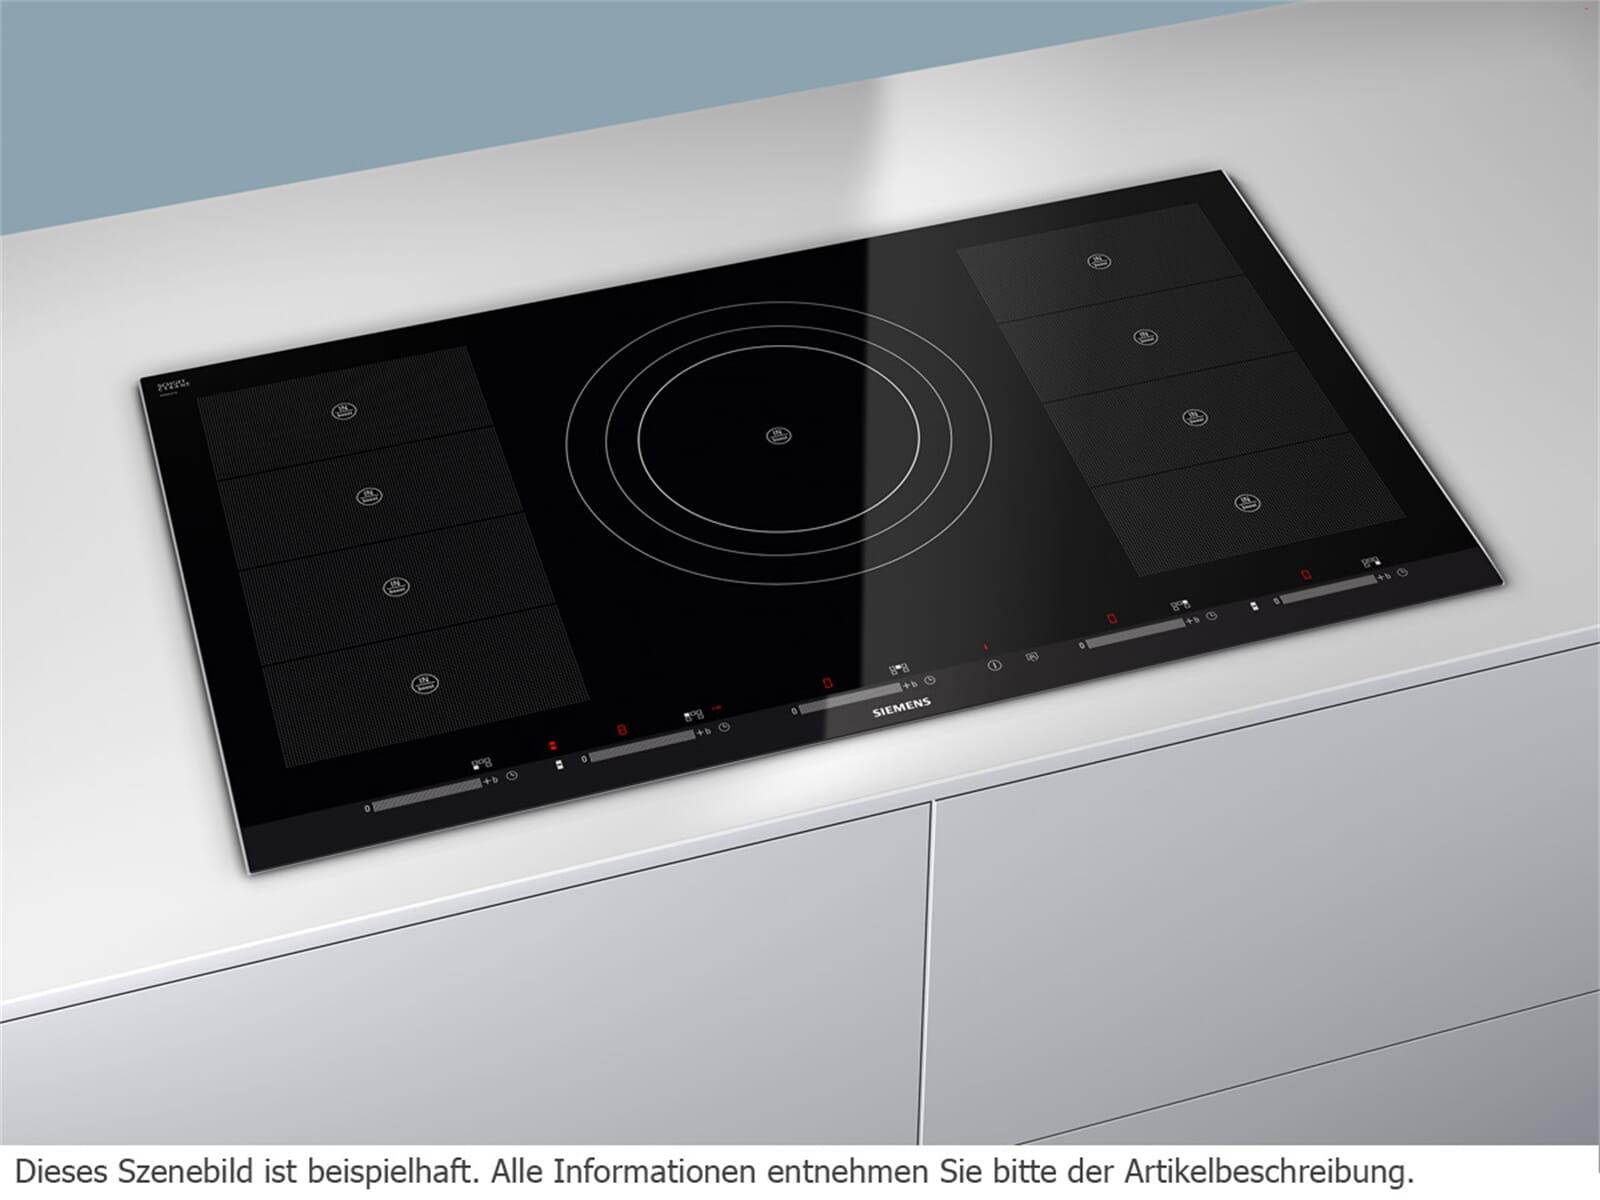 siemens eh975sz17e induktion glaskeramik kochfeld autark f r 999 90 eur. Black Bedroom Furniture Sets. Home Design Ideas